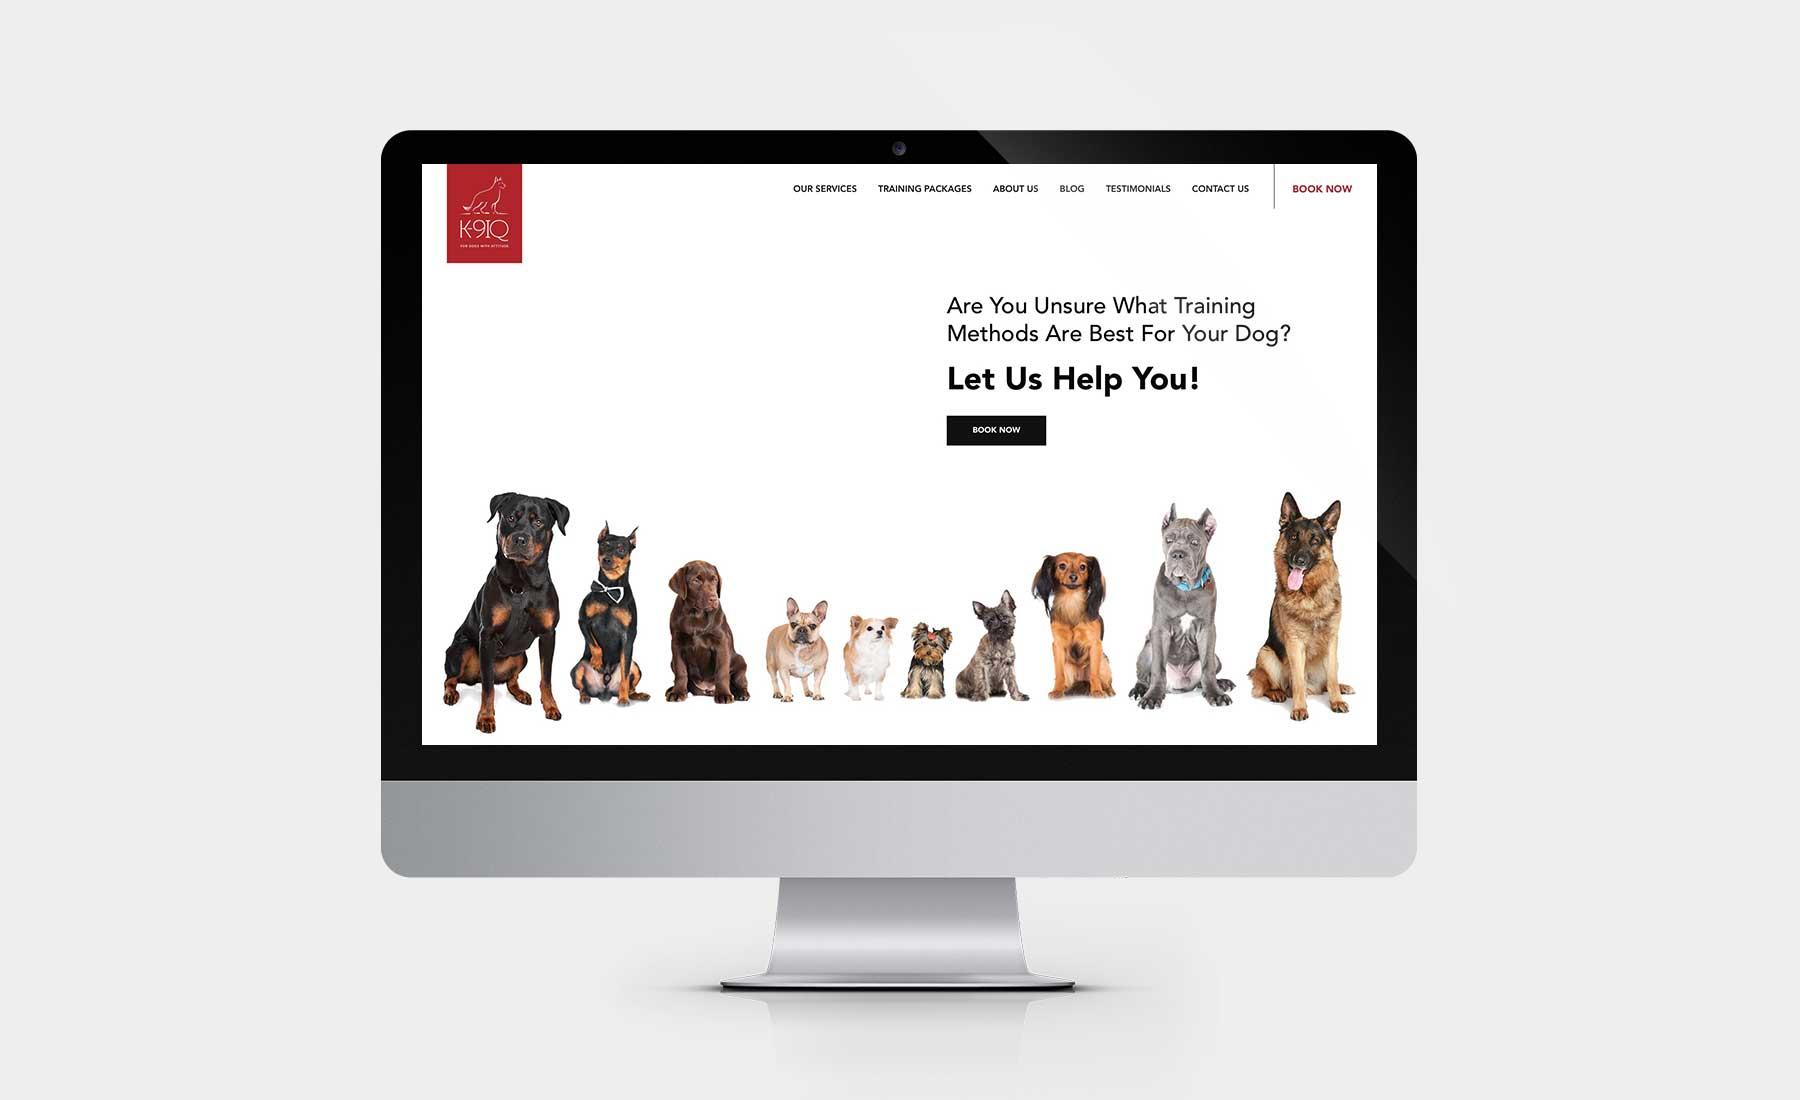 K9IQ homepage desktop design on iMac